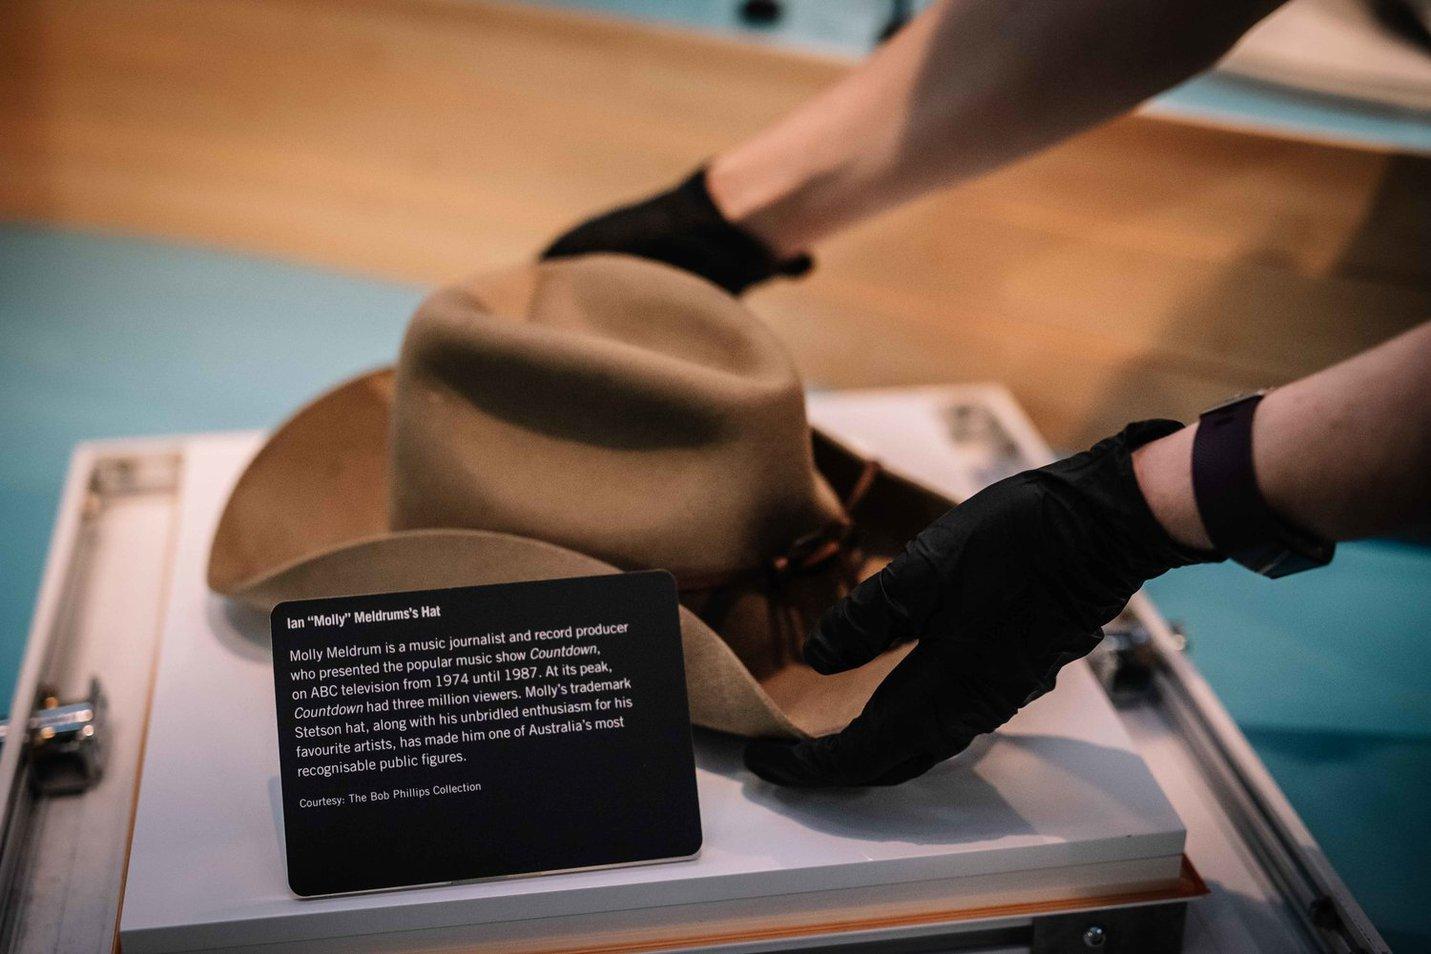 Ian Molly Meldrum's hat - Phoebe Powell